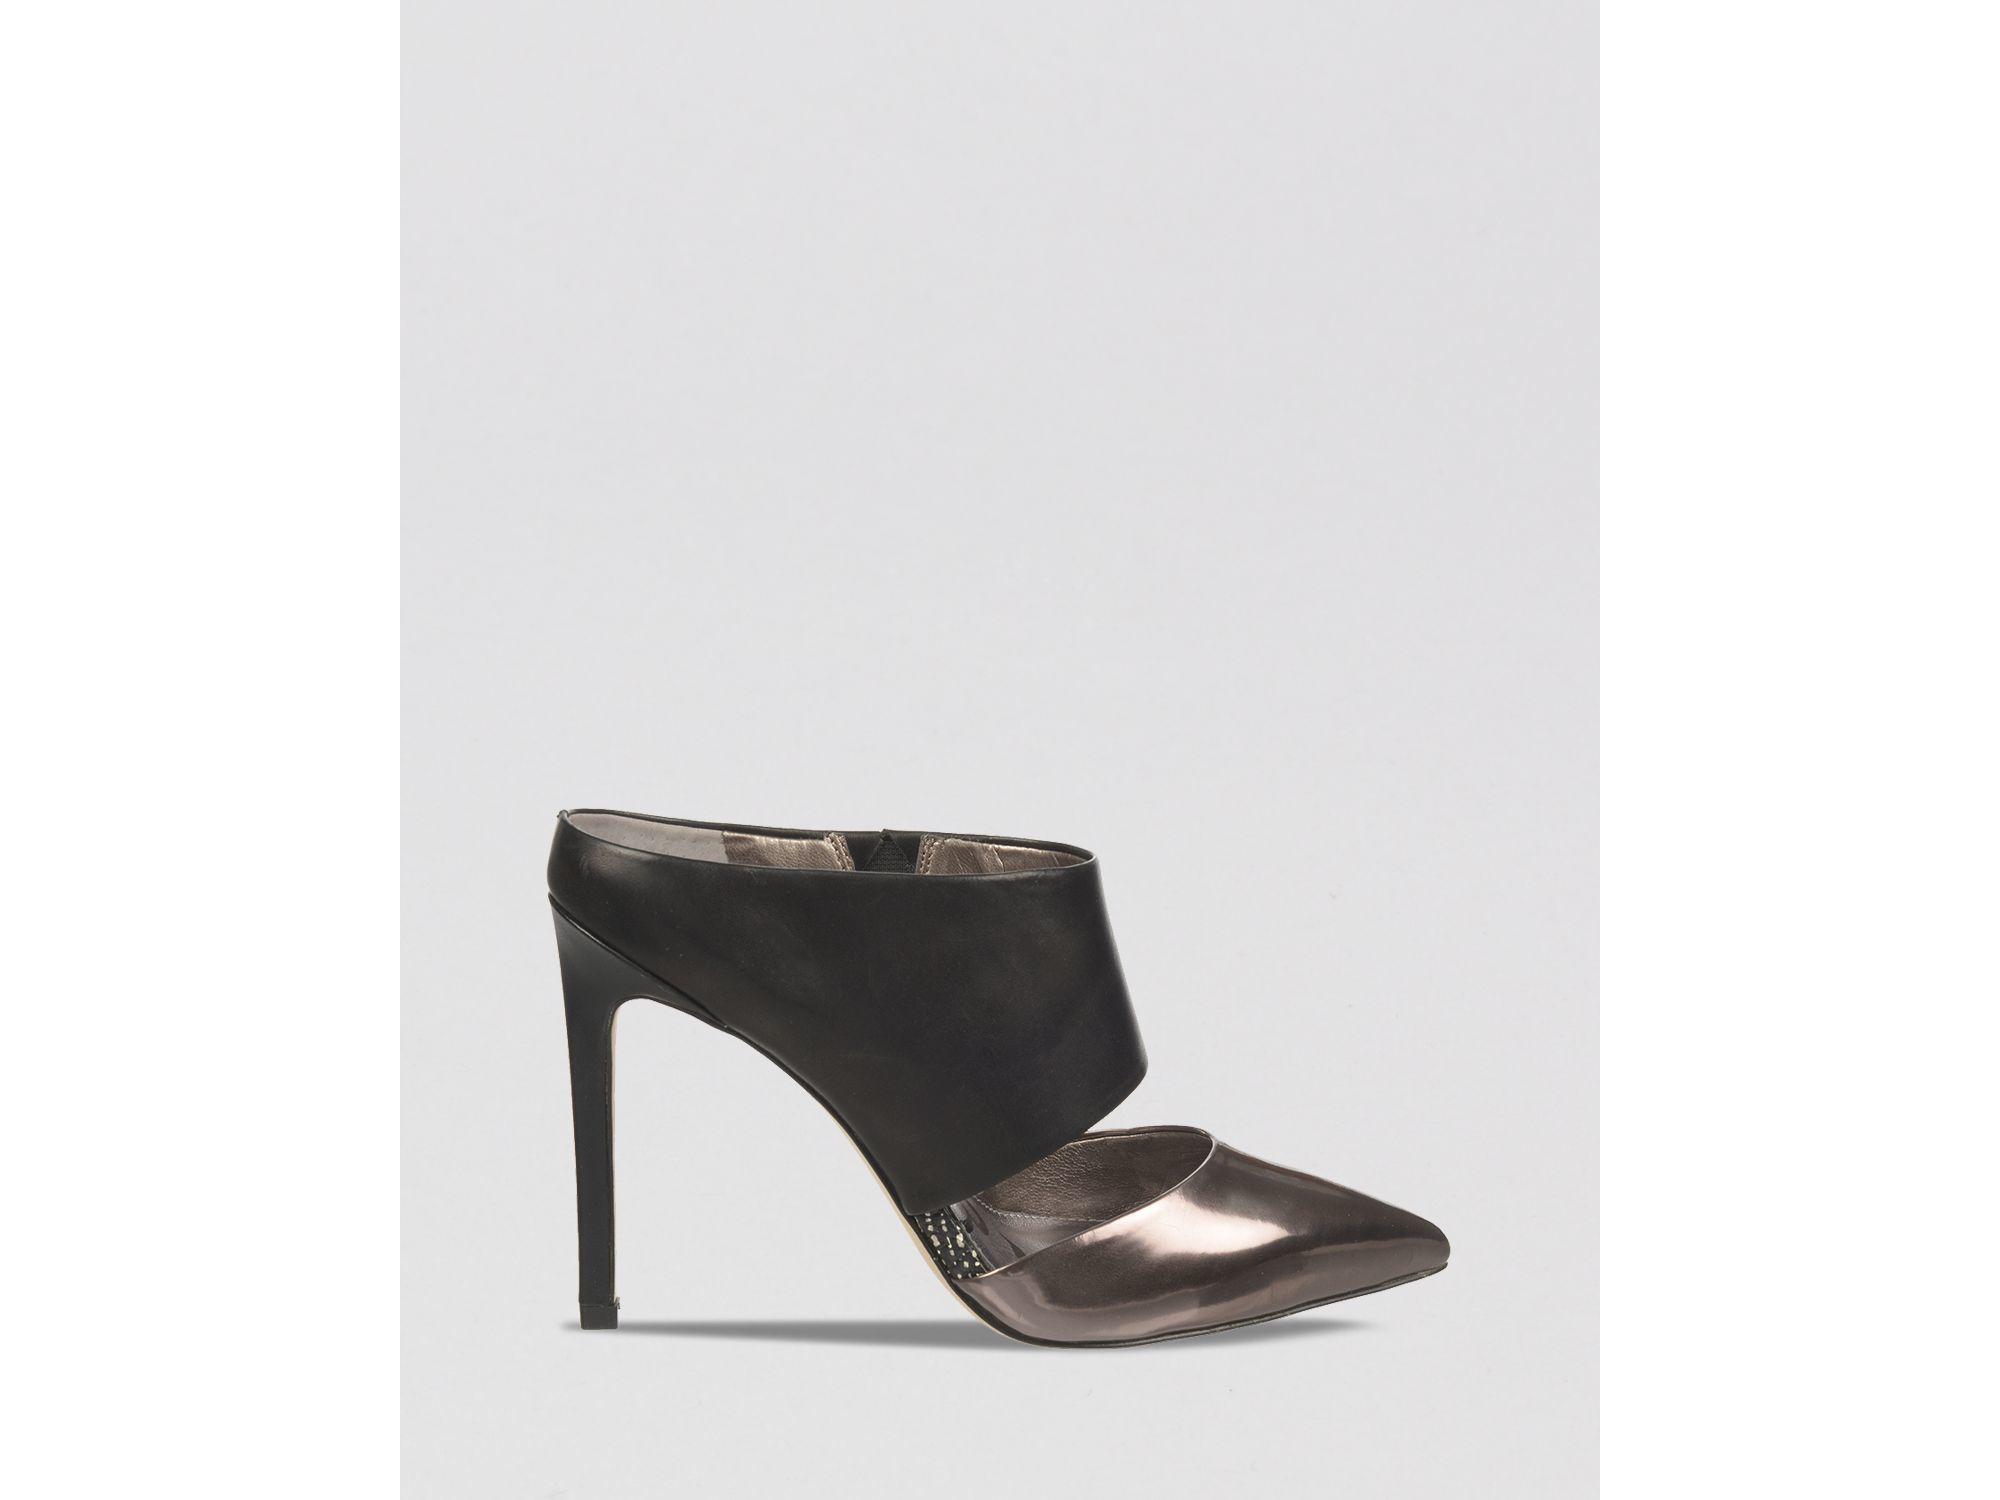 bf66cb0f7d92 Sam Edelman Pointed Toe Mule Slide Pumps - Monroe High Heel in ...